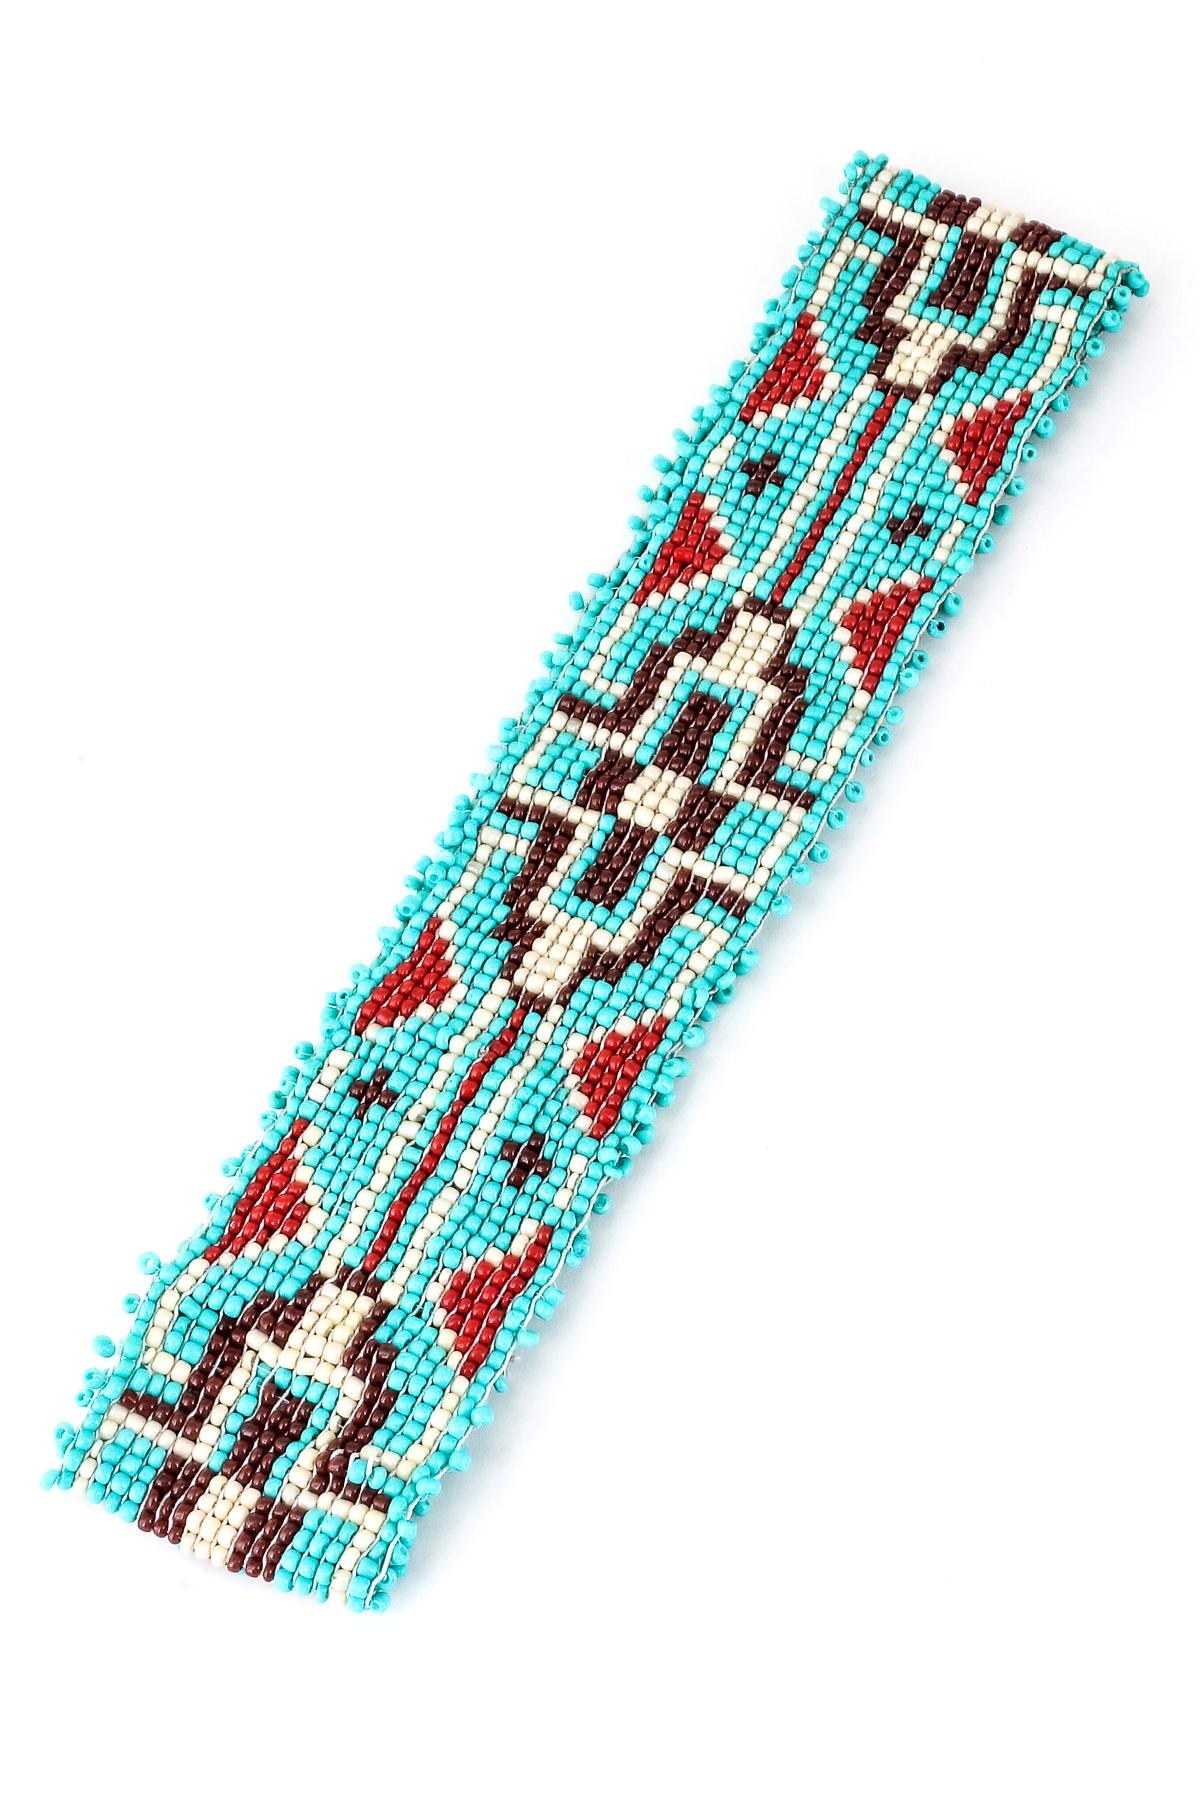 seed bead cross patterns patterns kid